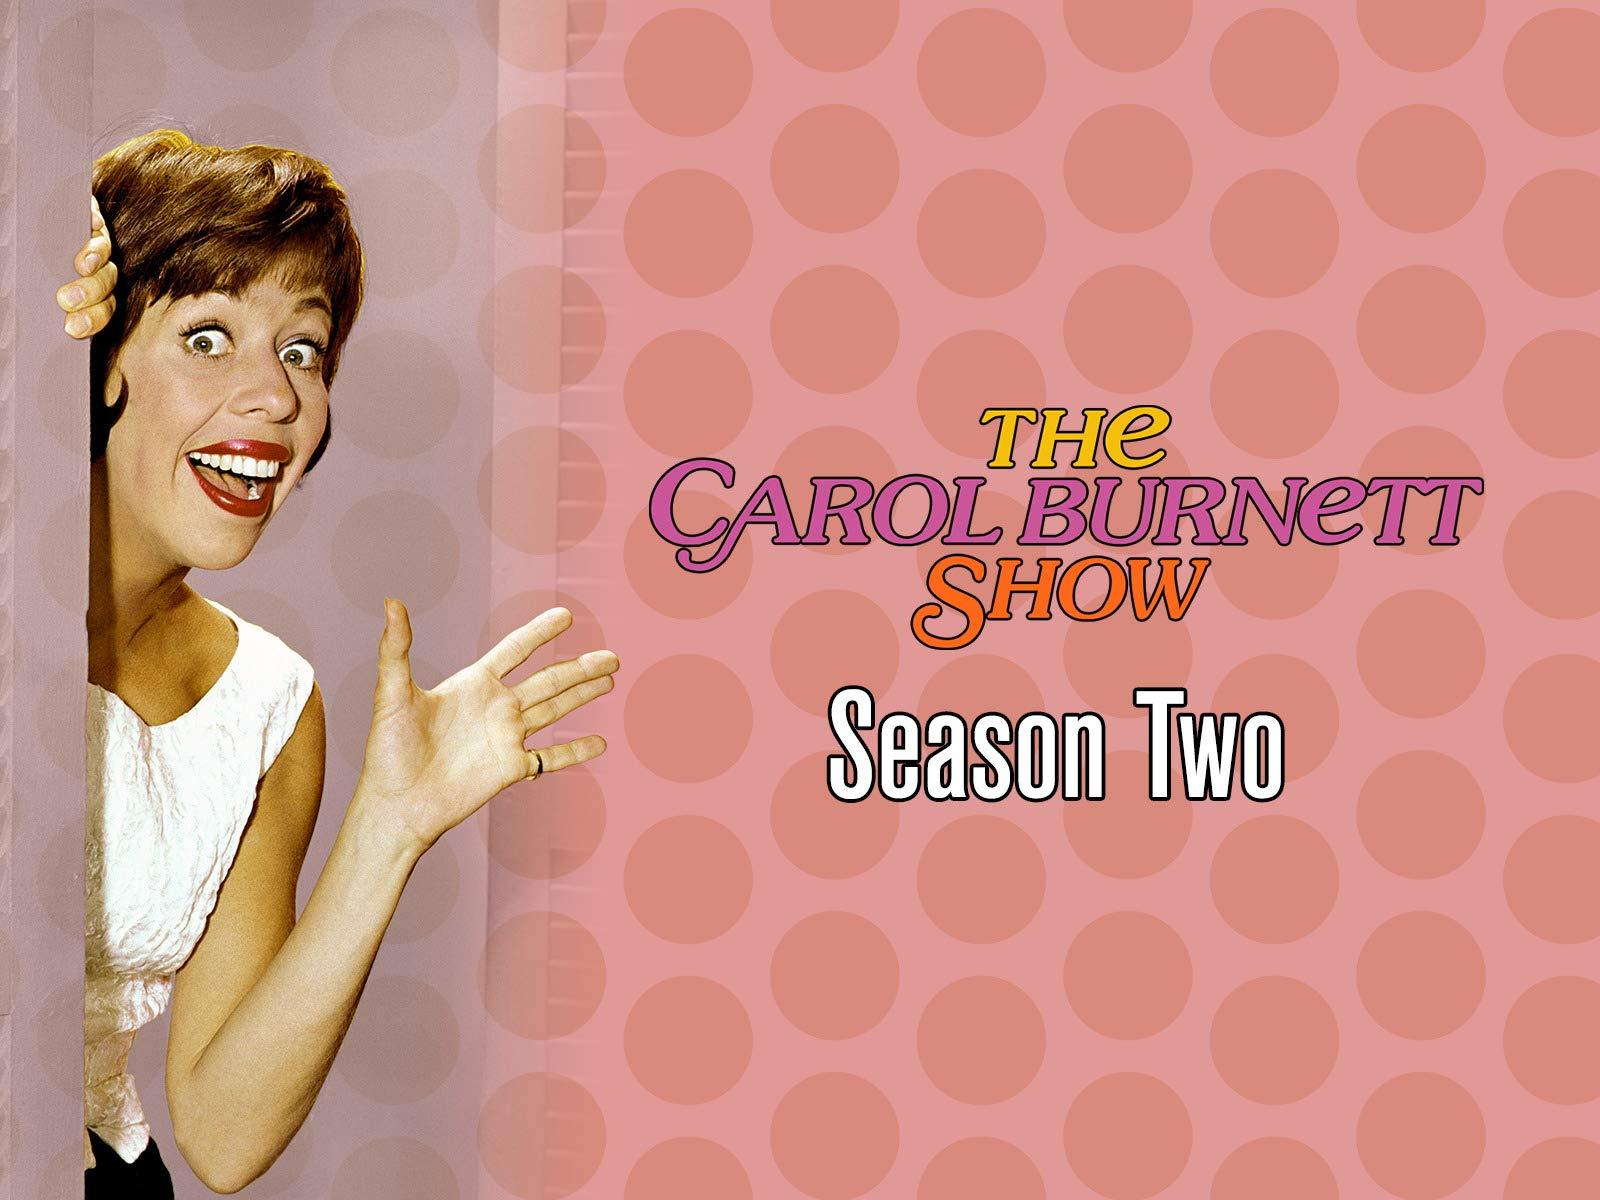 The Carol Burnett Show - Season 2